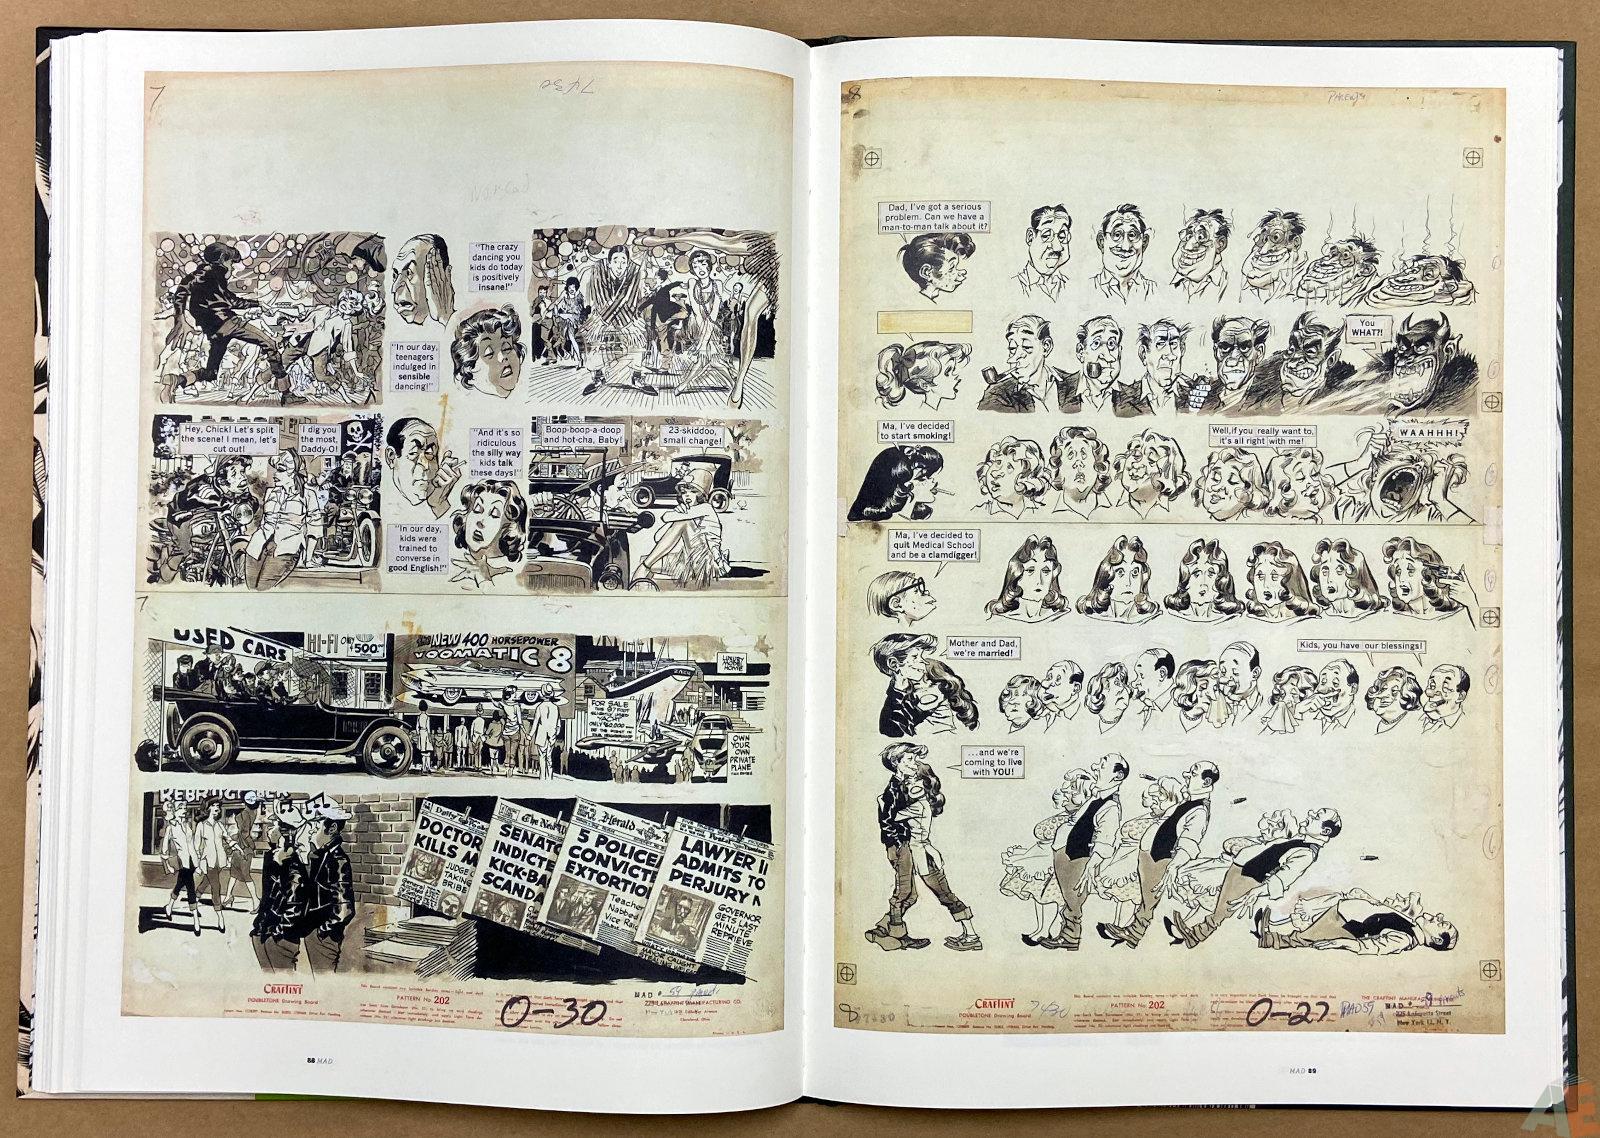 Les Mondes De Wallace Wood catalogue interior 10